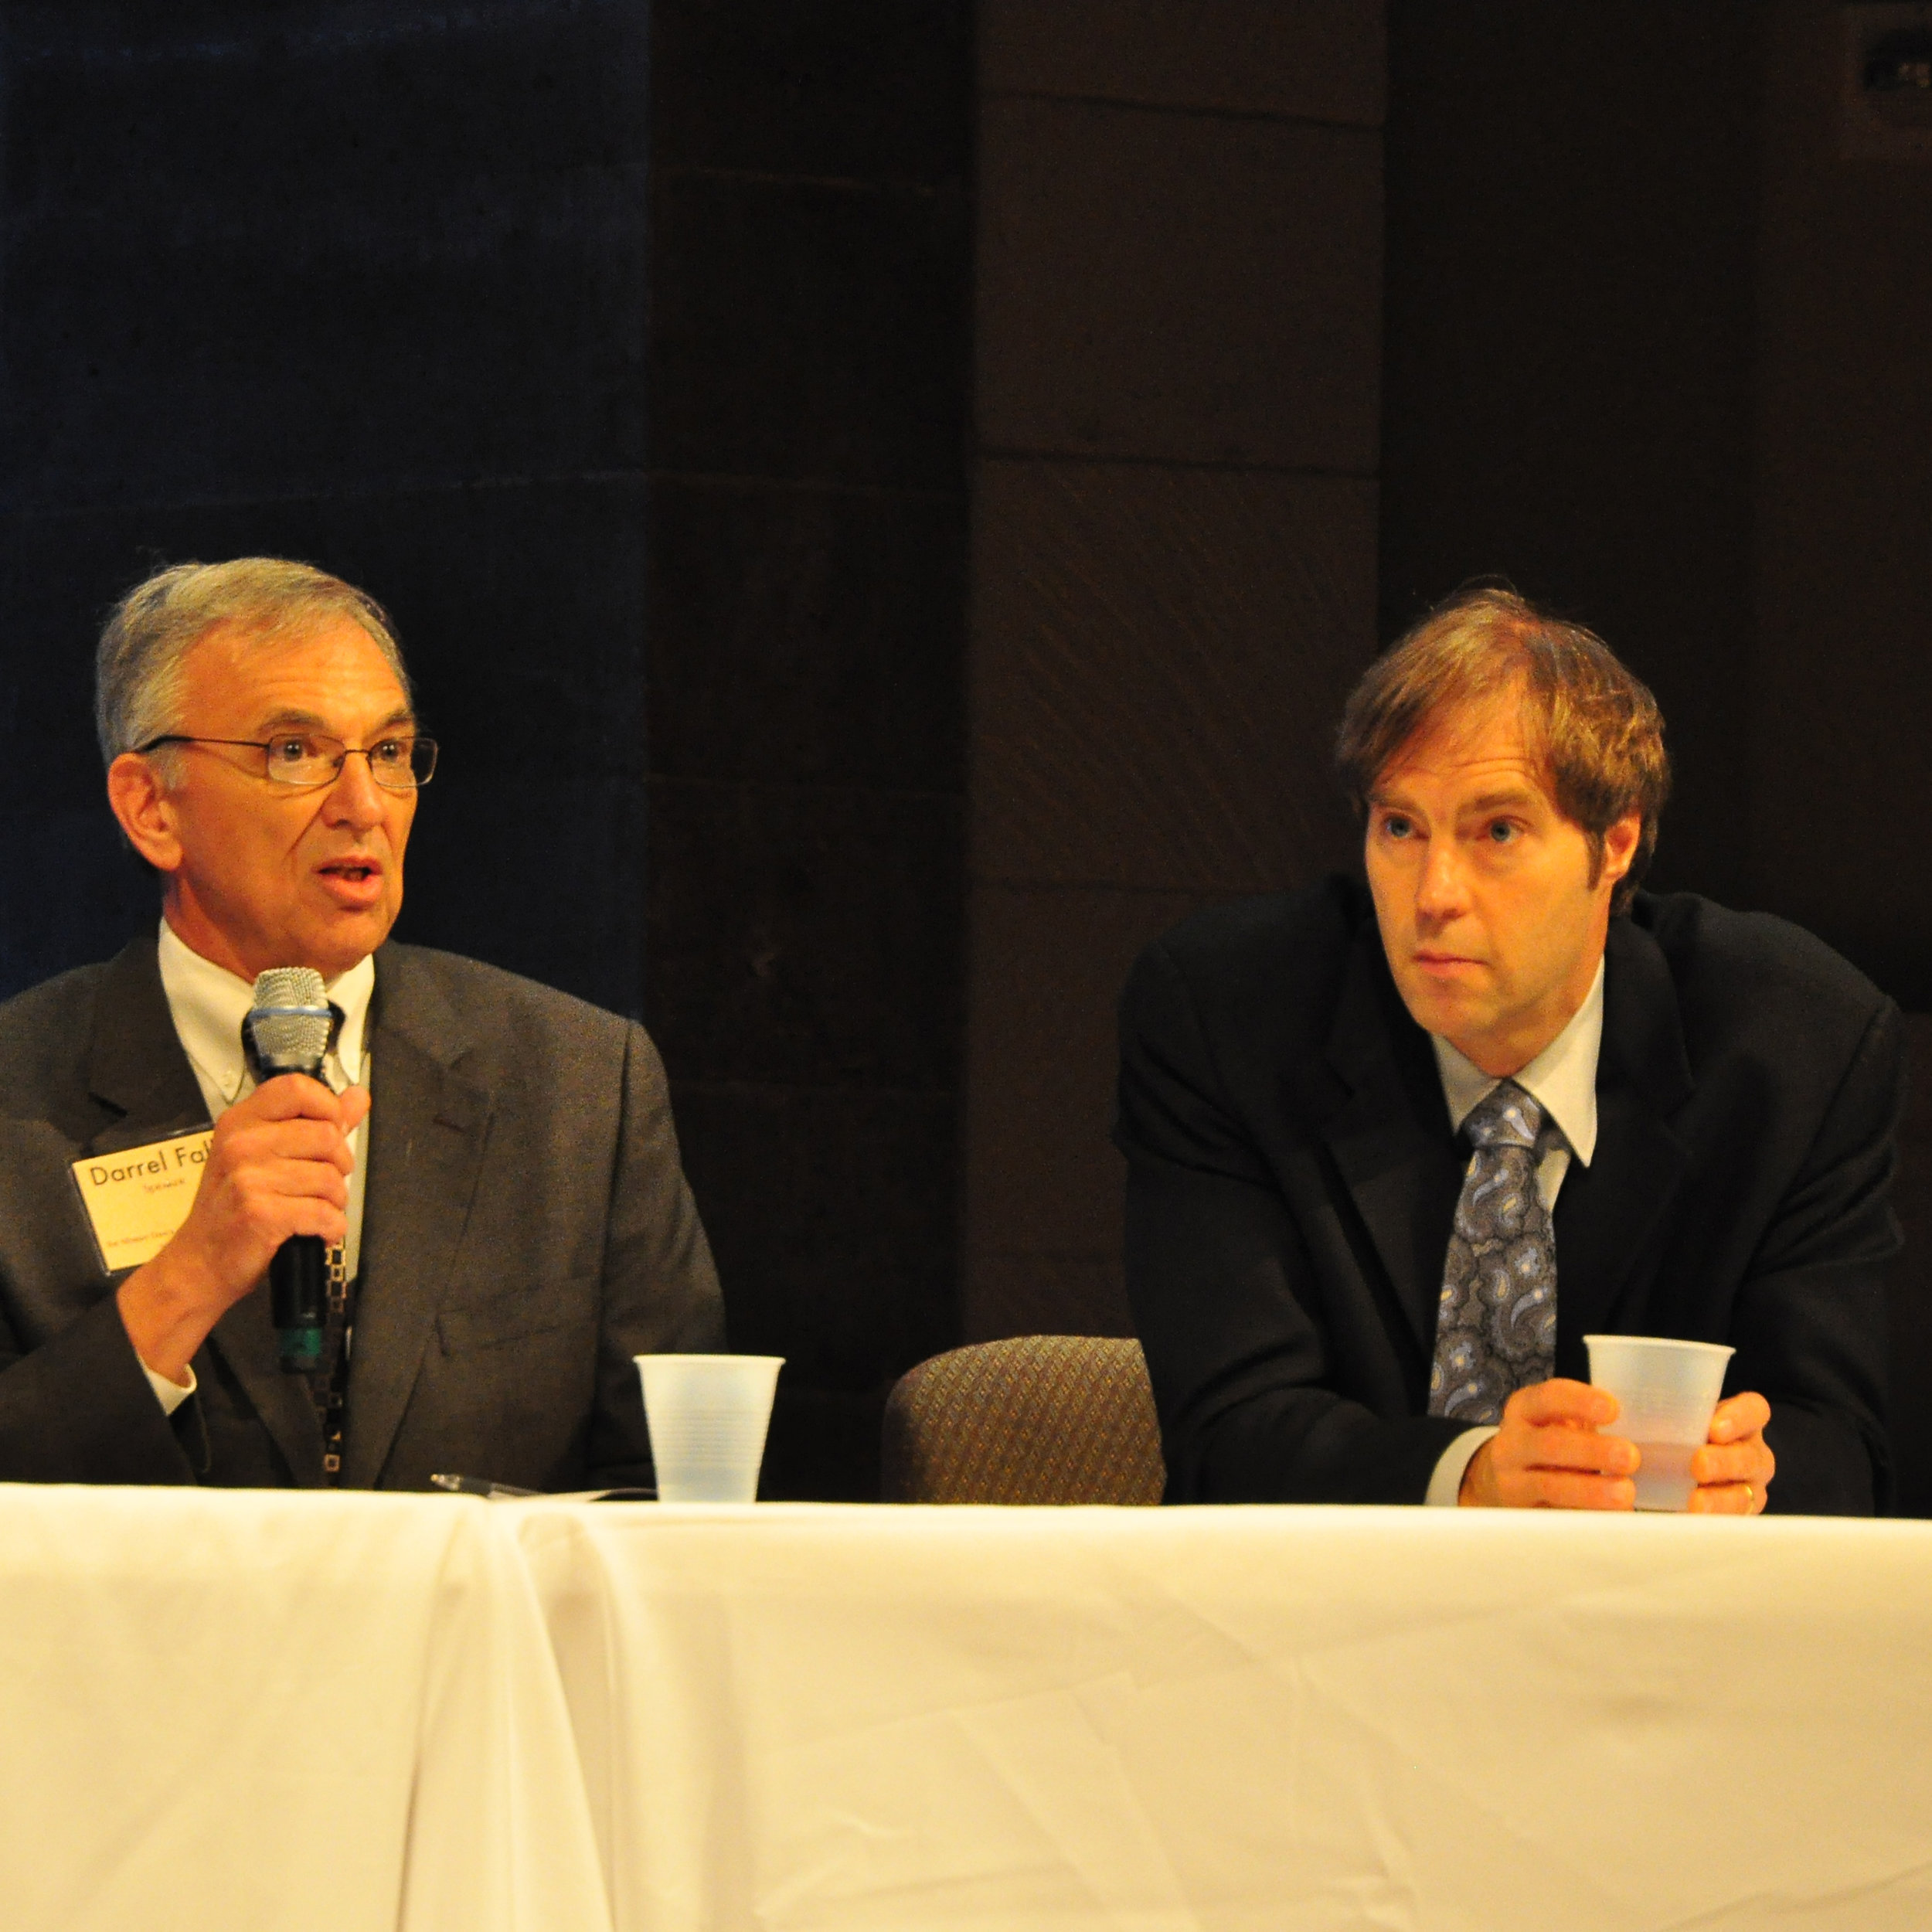 Steve Meyer and Darrell Falk.JPG